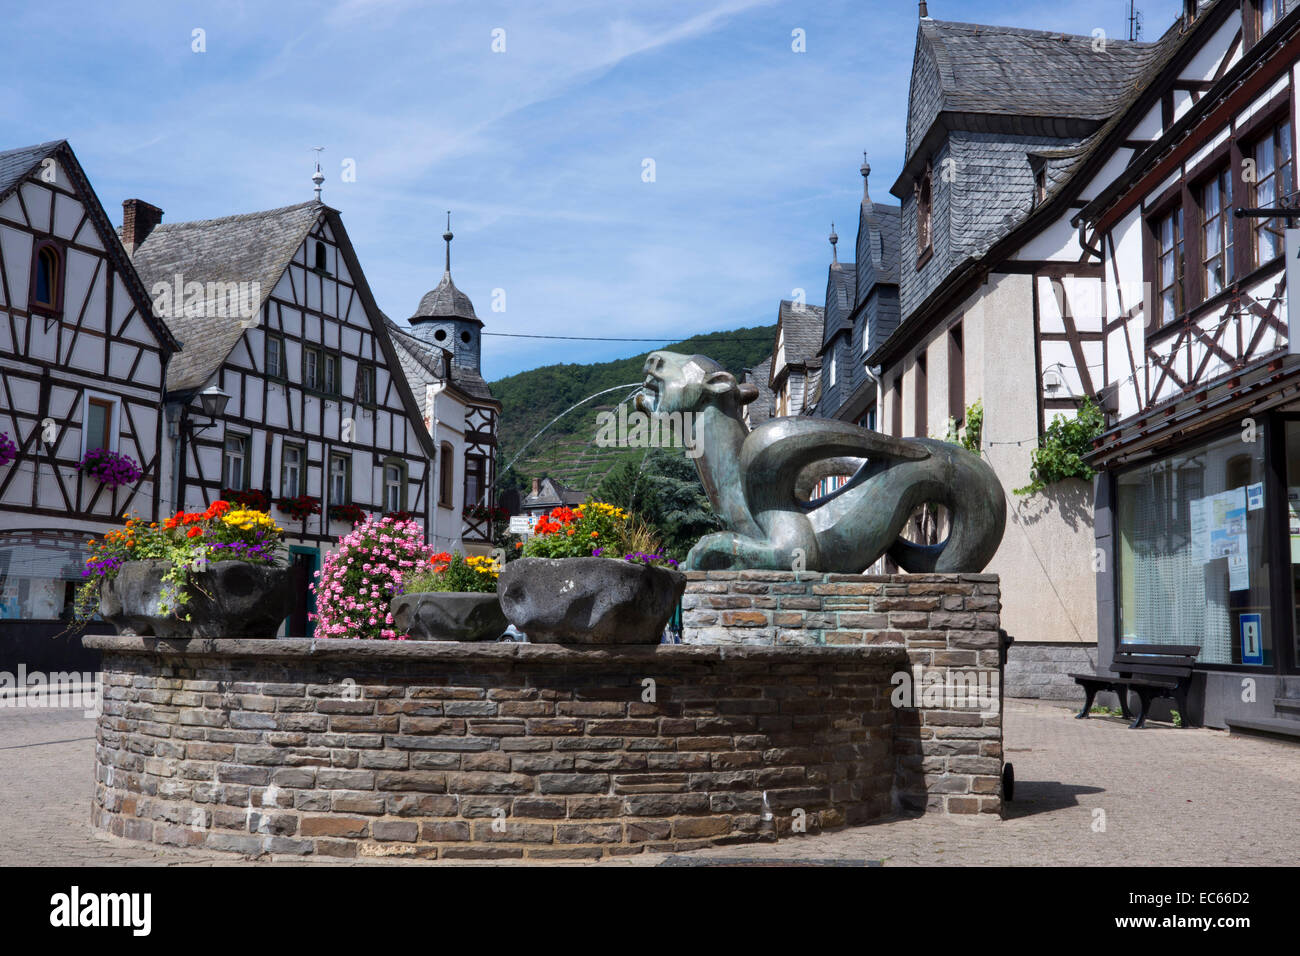 Tatzelwurm wine fountain in Kobern, Kobern Gondorf, Moselle, district Mayen Koblenz, Rhineland Palatinate, Germany, - Stock Image